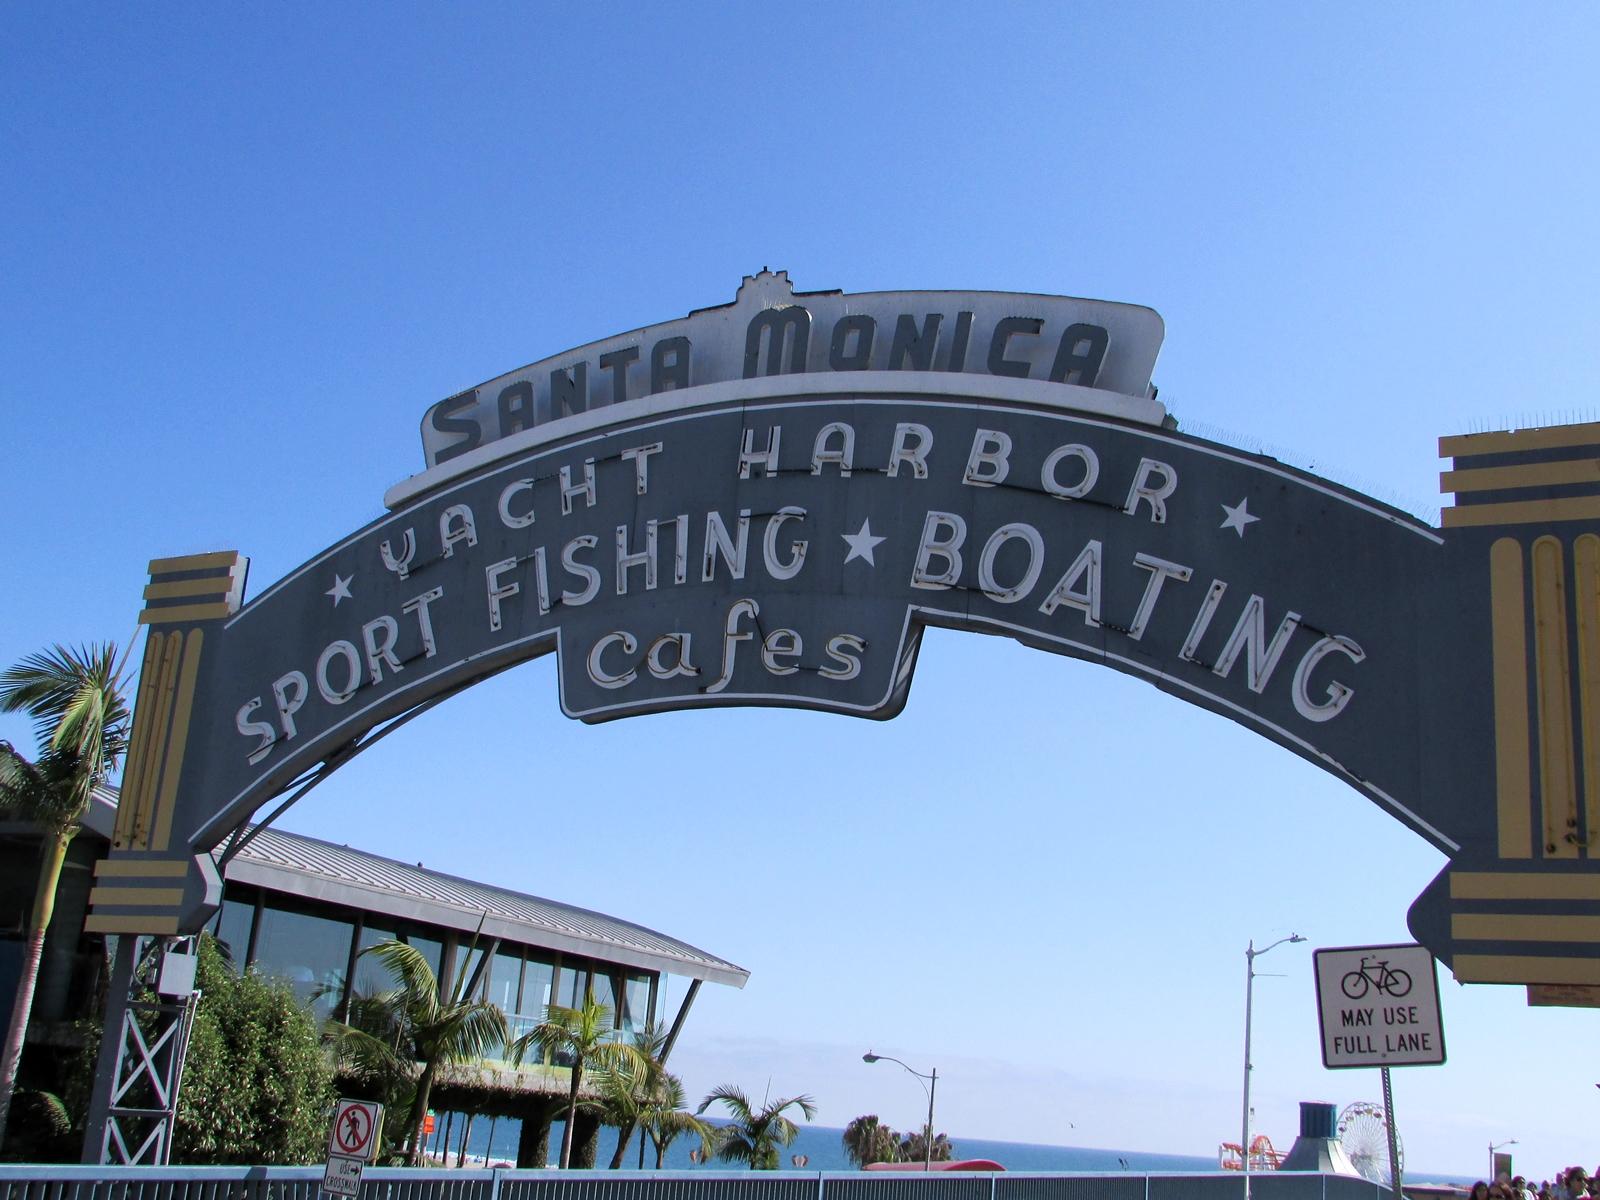 USA Rundreise - Amerika Westküste - Santa Monica - Strand Pier - Fashionladyloves by Tamara Wagner